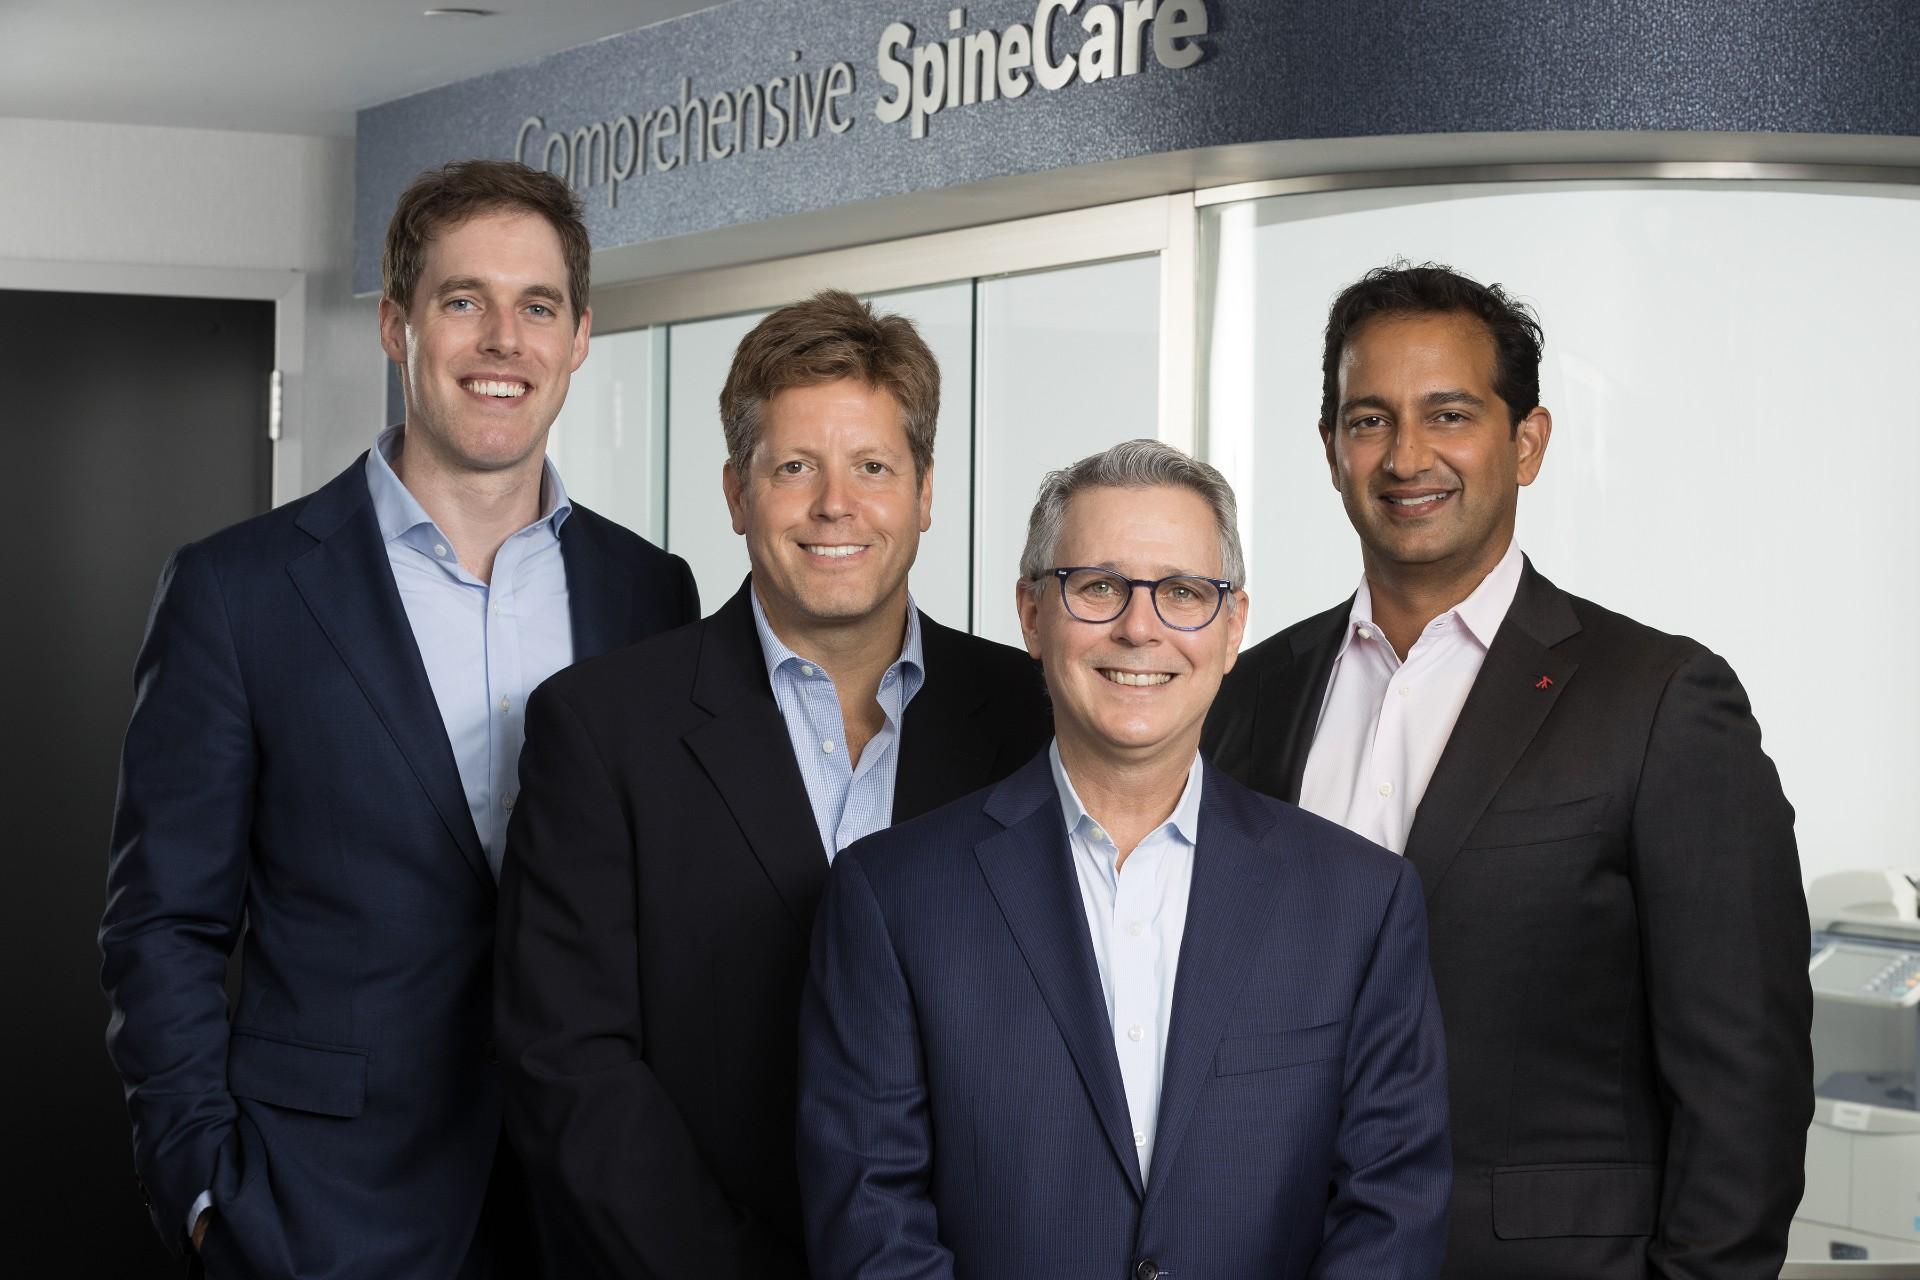 Comprehensive spine care Doctors